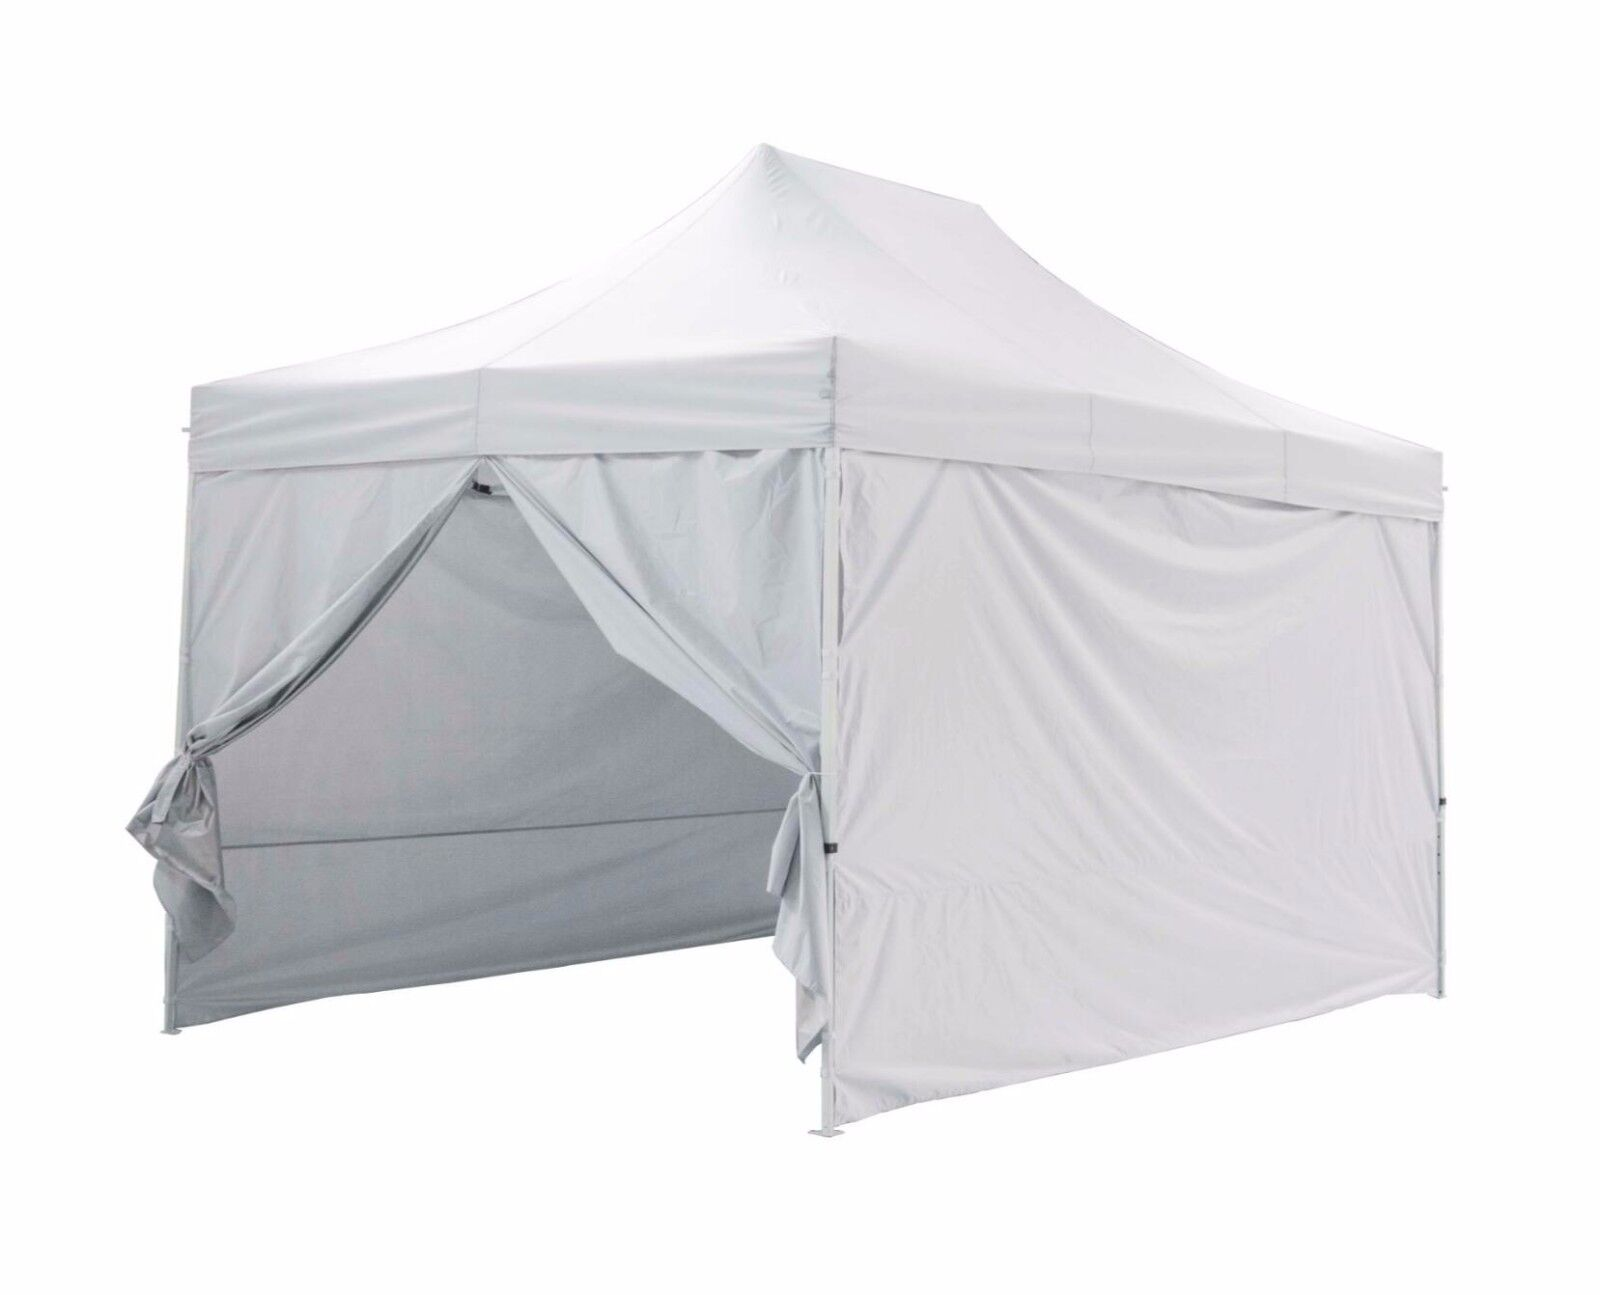 GREADEN -Tente pliante blancohe avec  4 murs amovibles 3x4.5m PREMIUM LIGHT Jardin  las mejores marcas venden barato